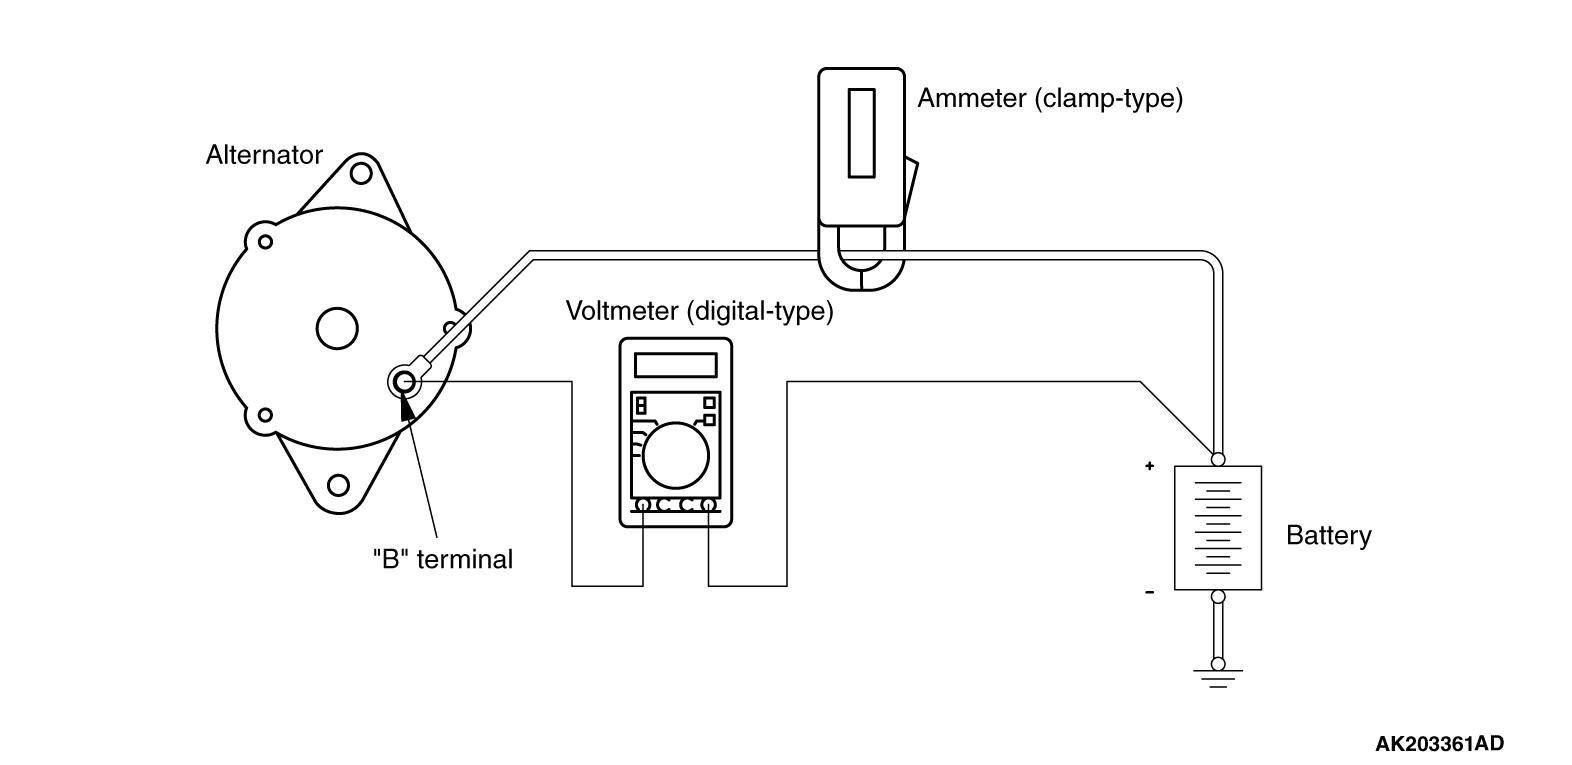 alternator voltmeter wiring diagram